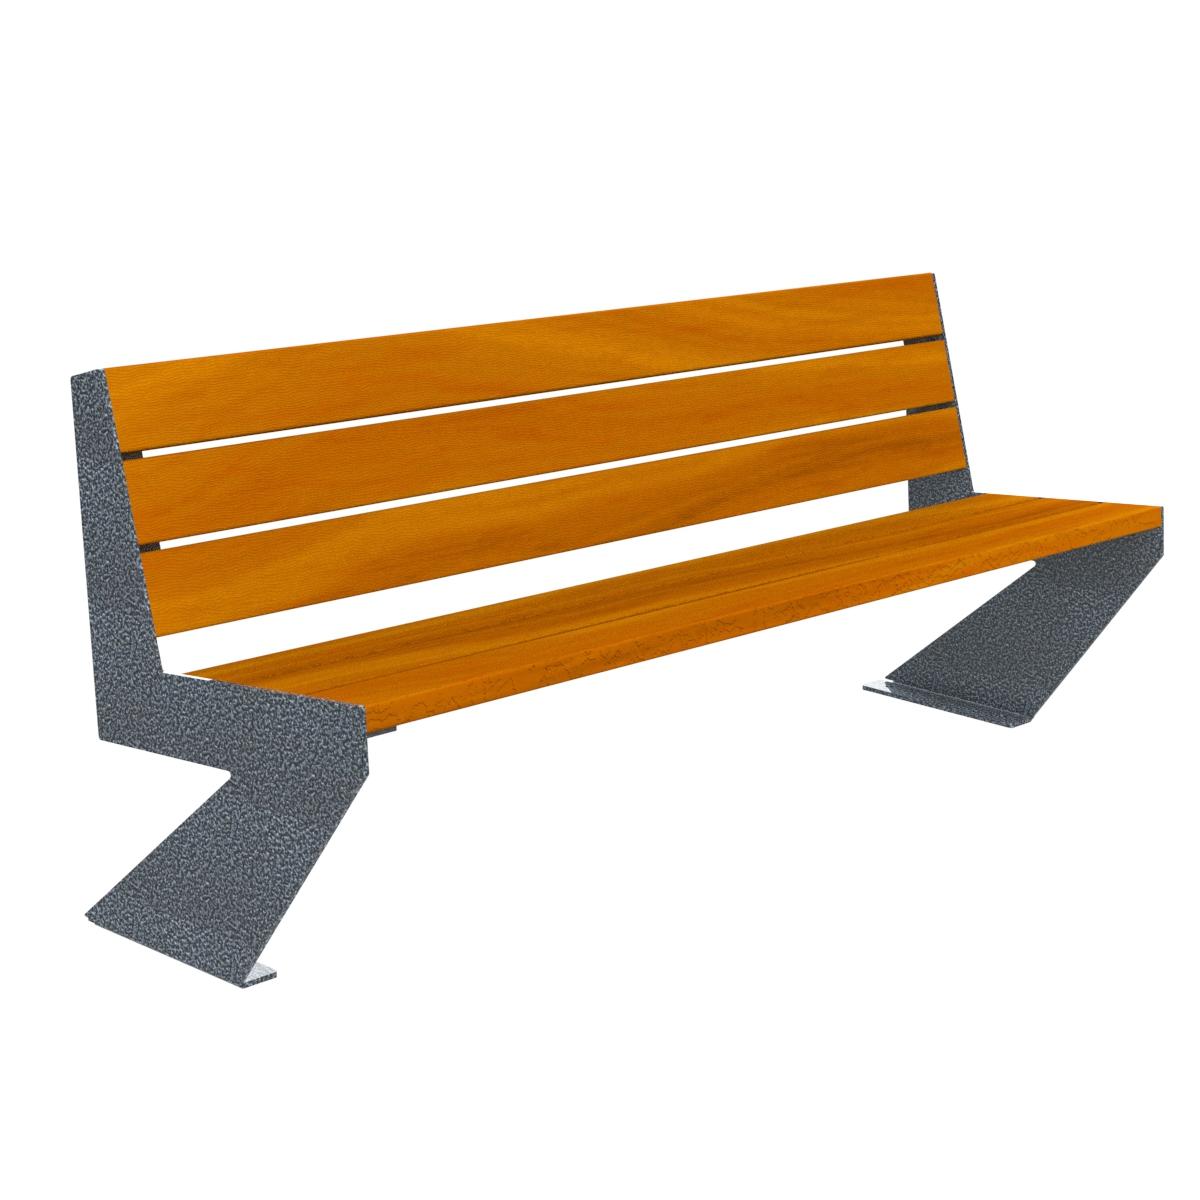 Banco madera zenit patas pintadas mobiliario urbano for Banco para jardin